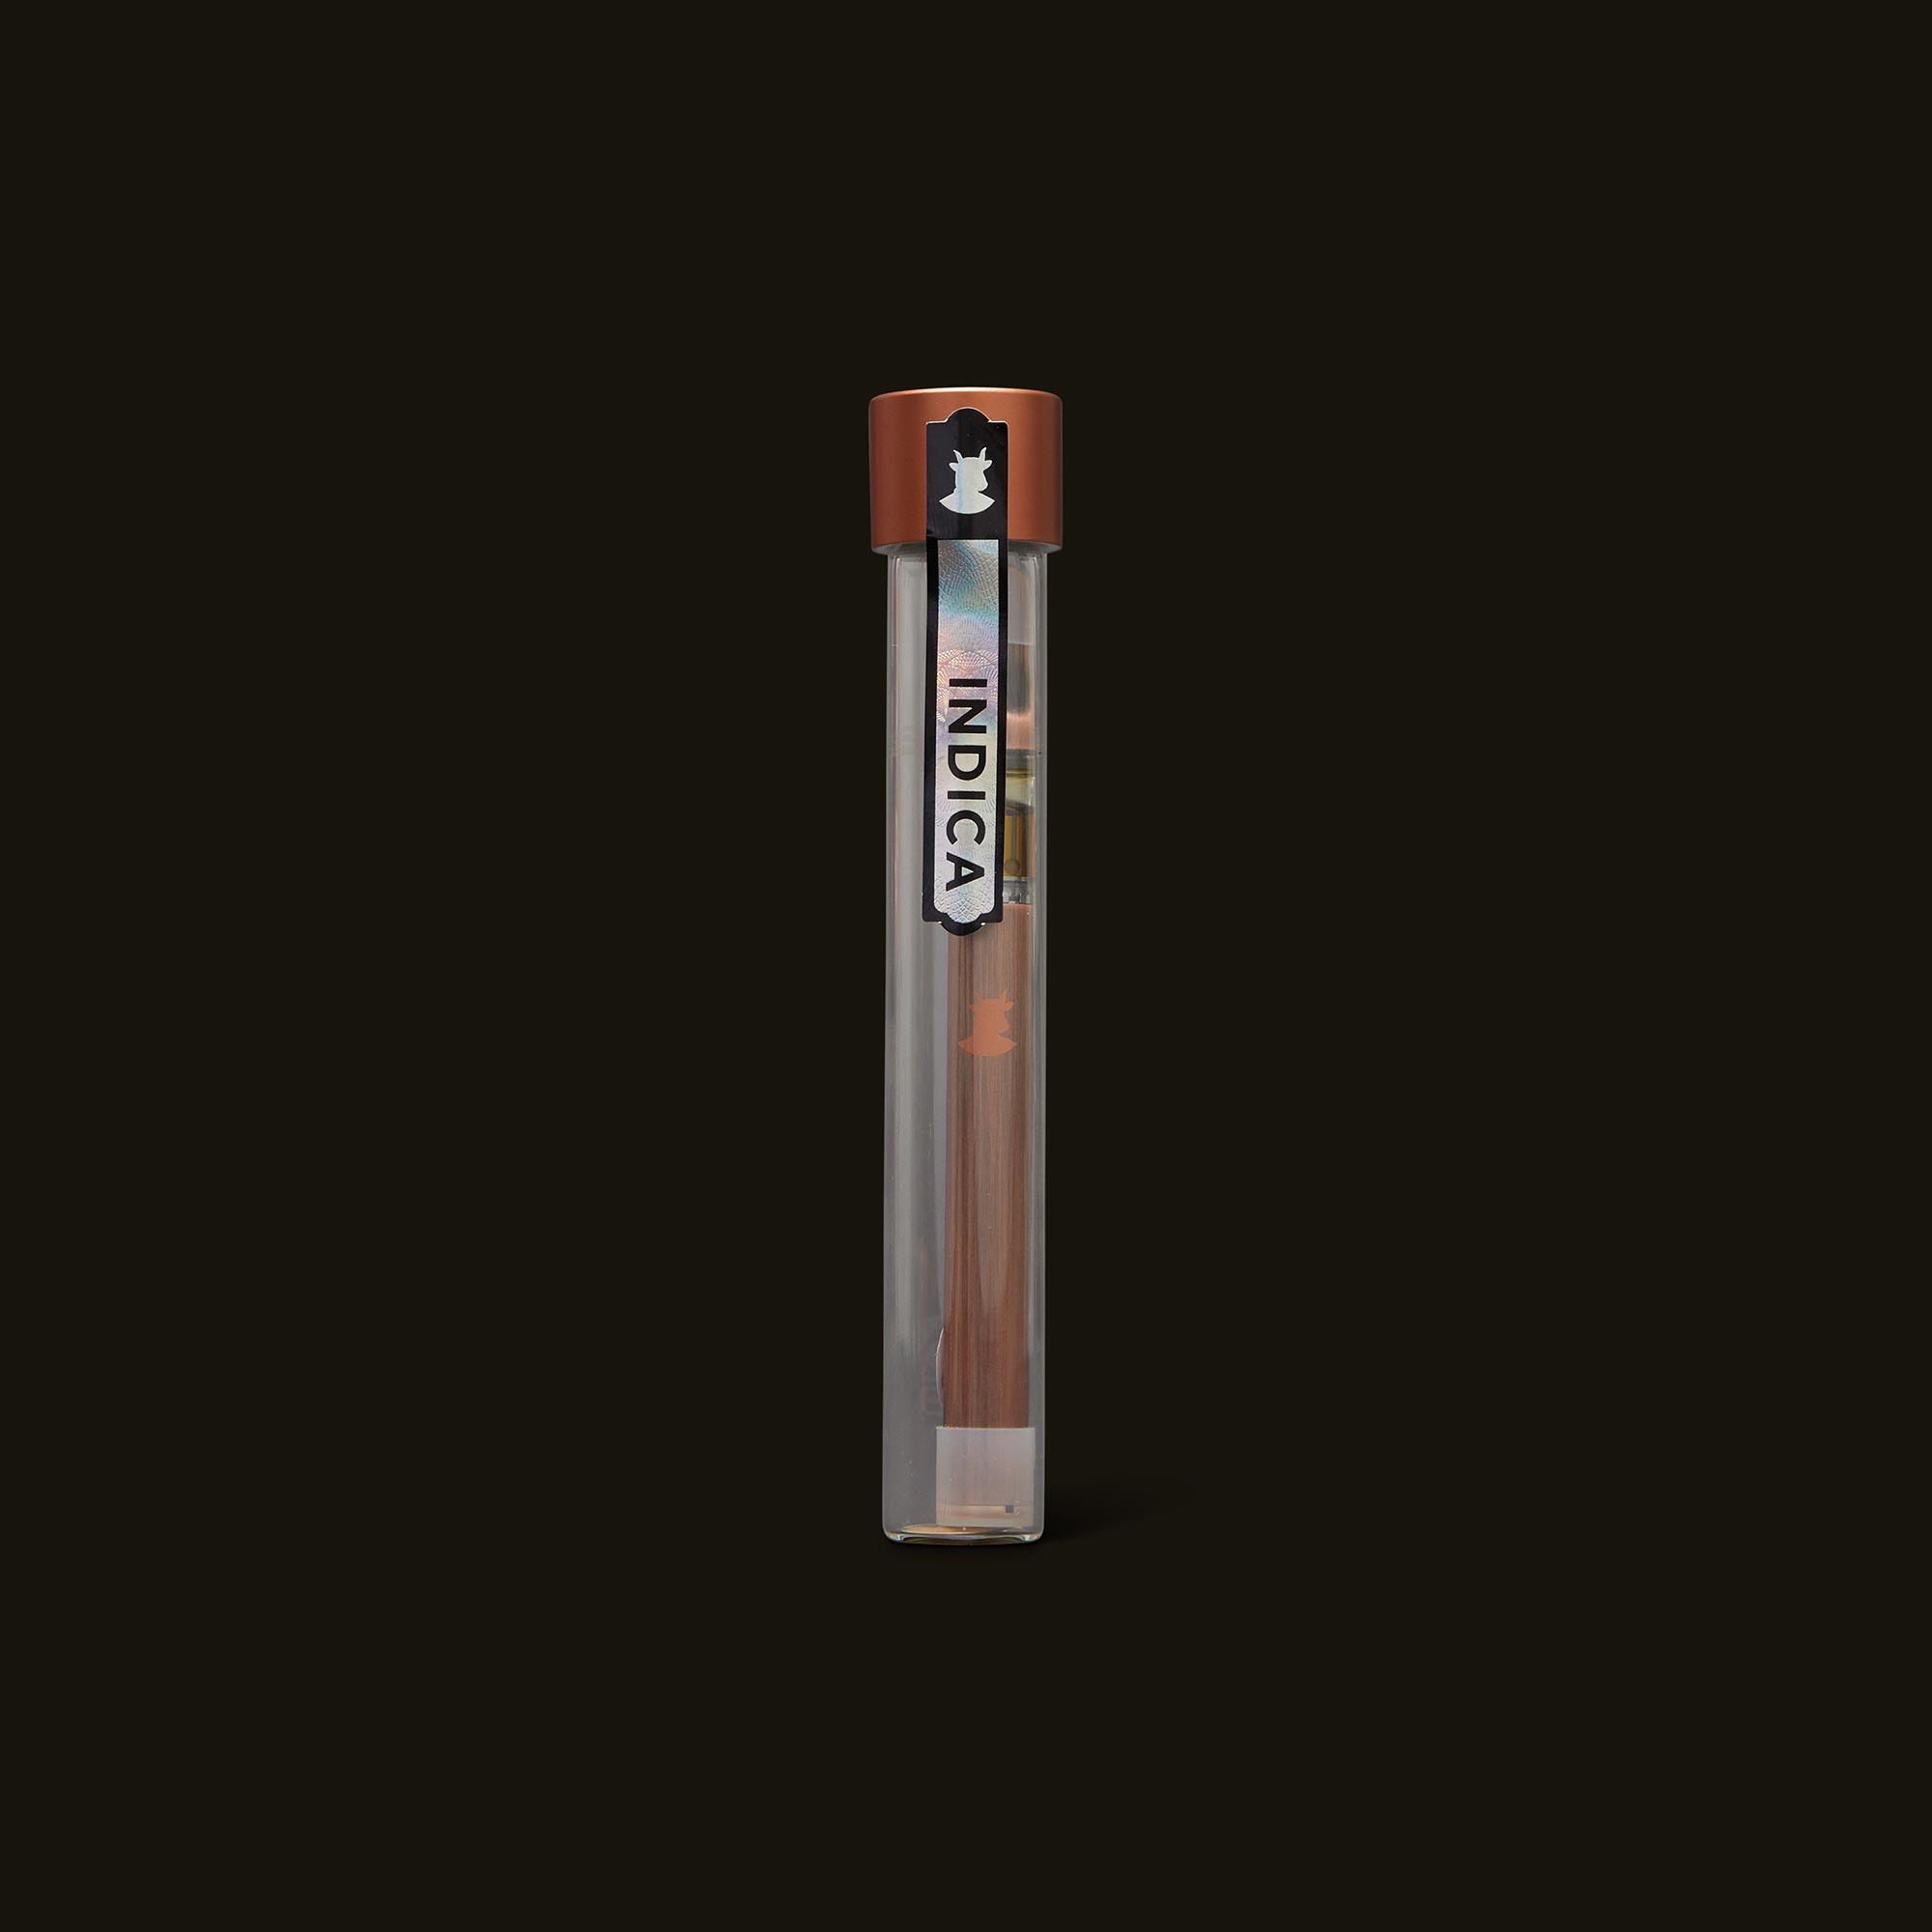 Medium Vape Pen by Lowell Herb Co.